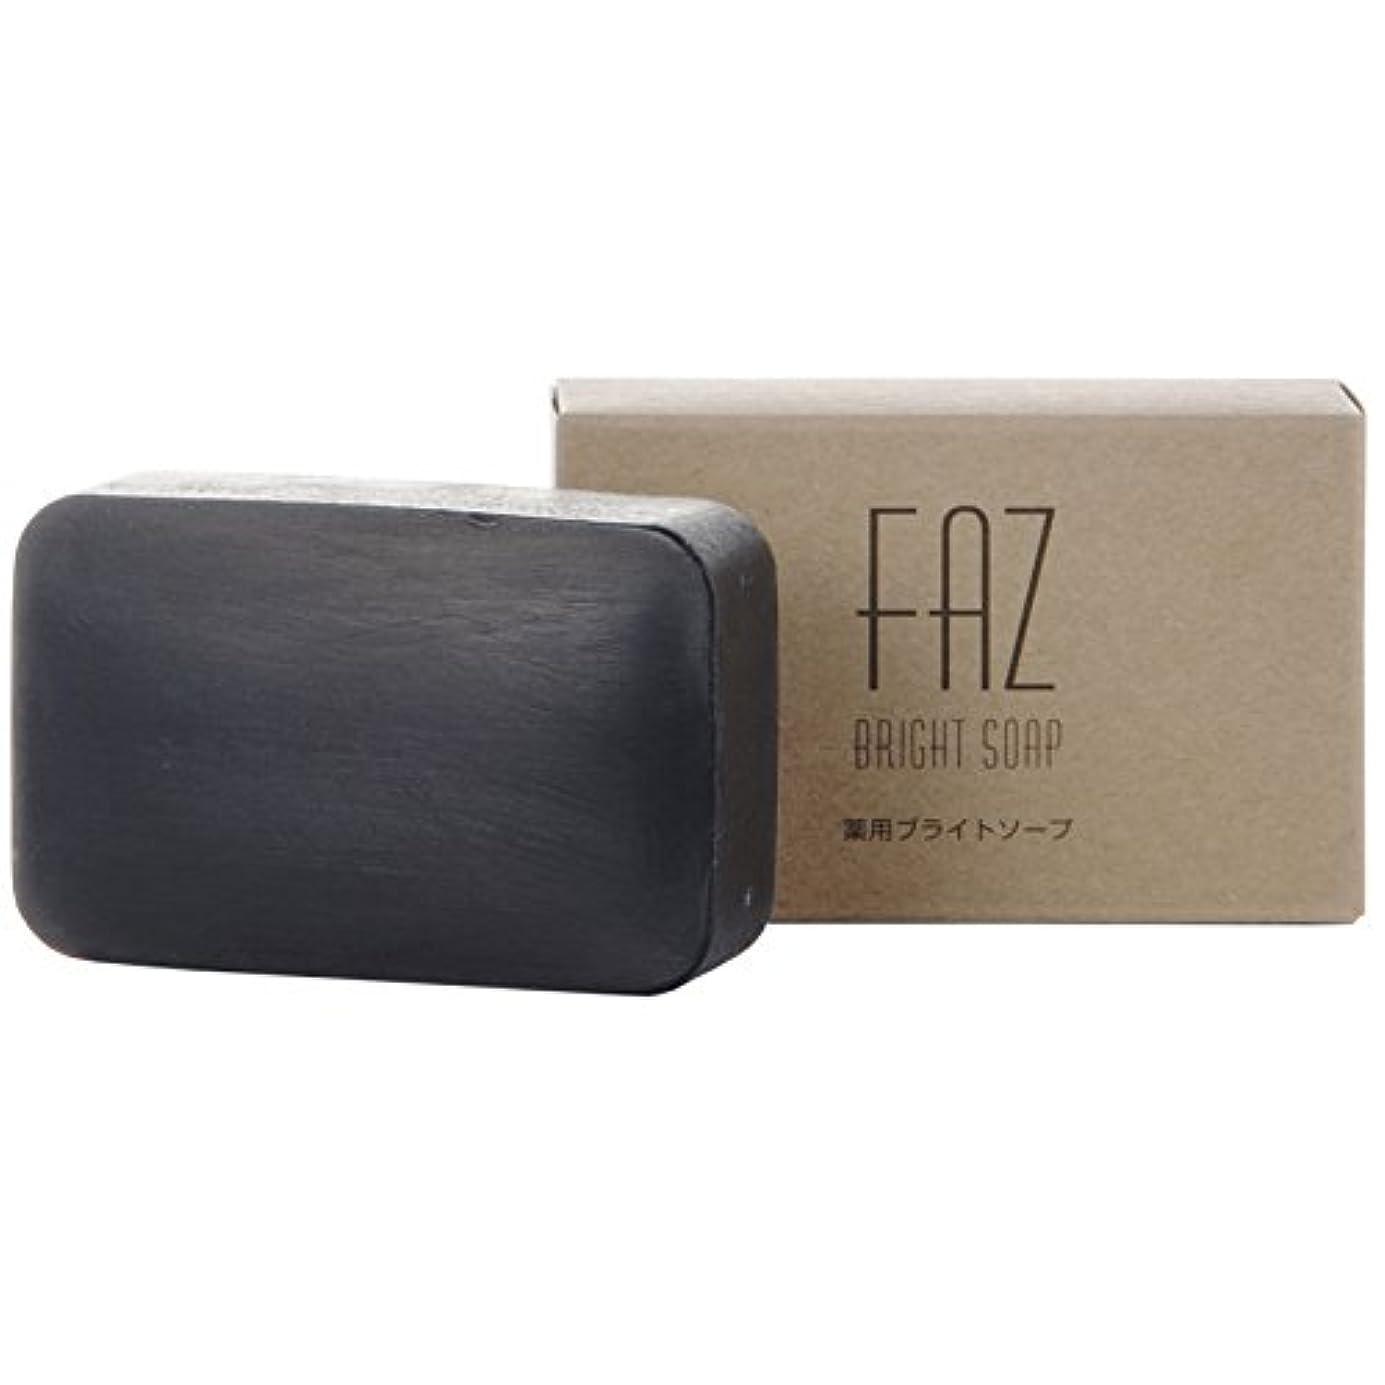 FAZ 薬用ブライトソープ 100g